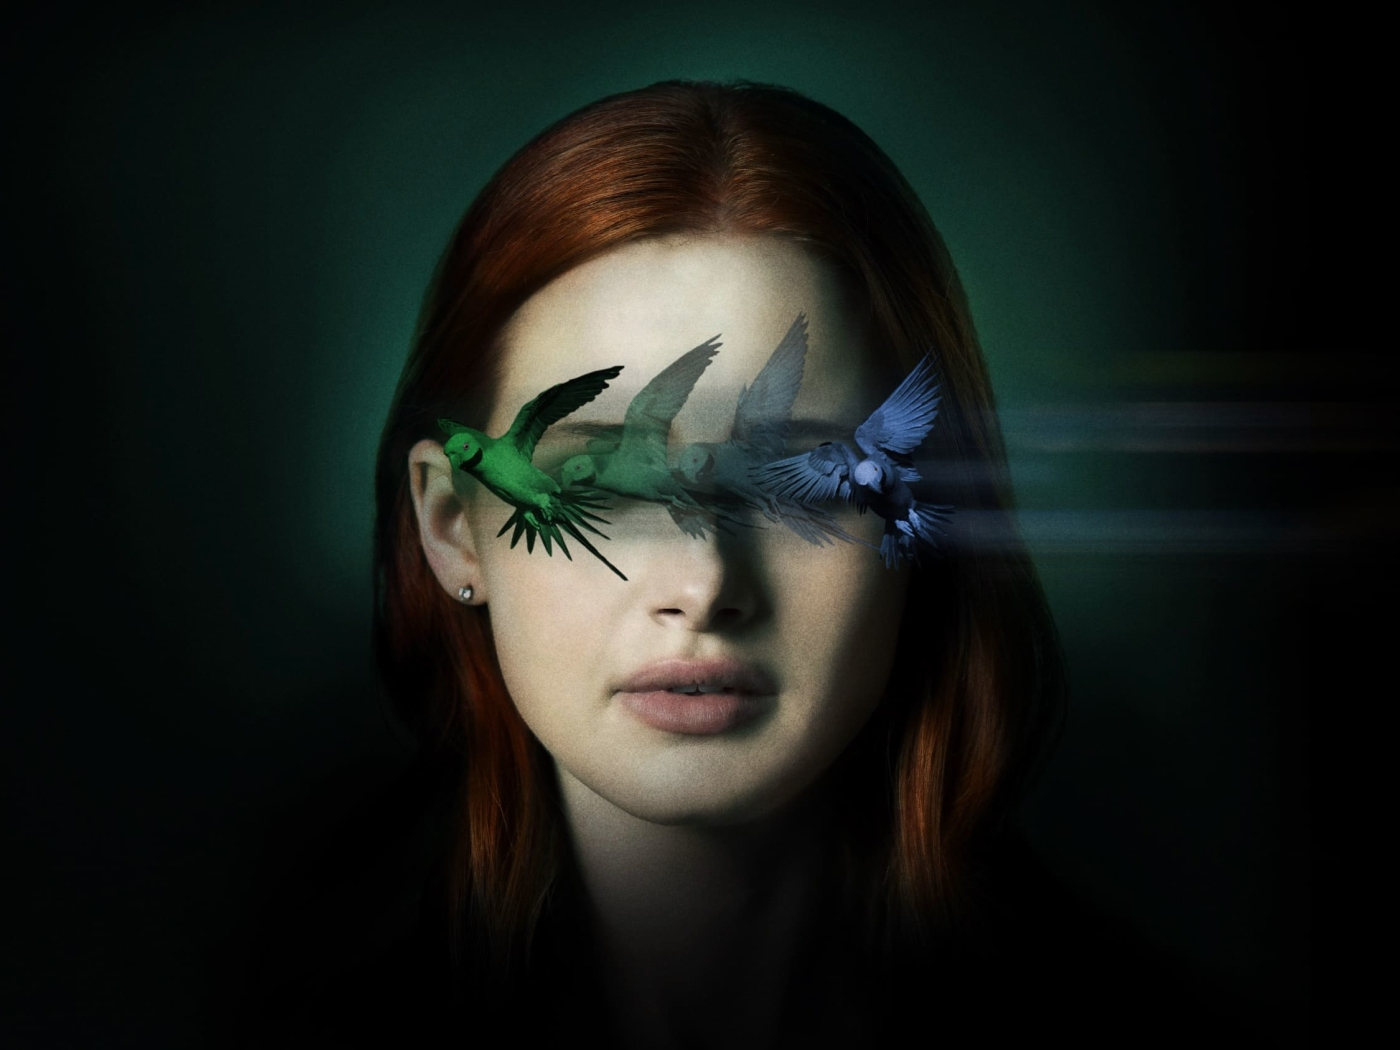 Madelaine Petsch Sightless Movie Wallpaper in 1400x1050 Resolution